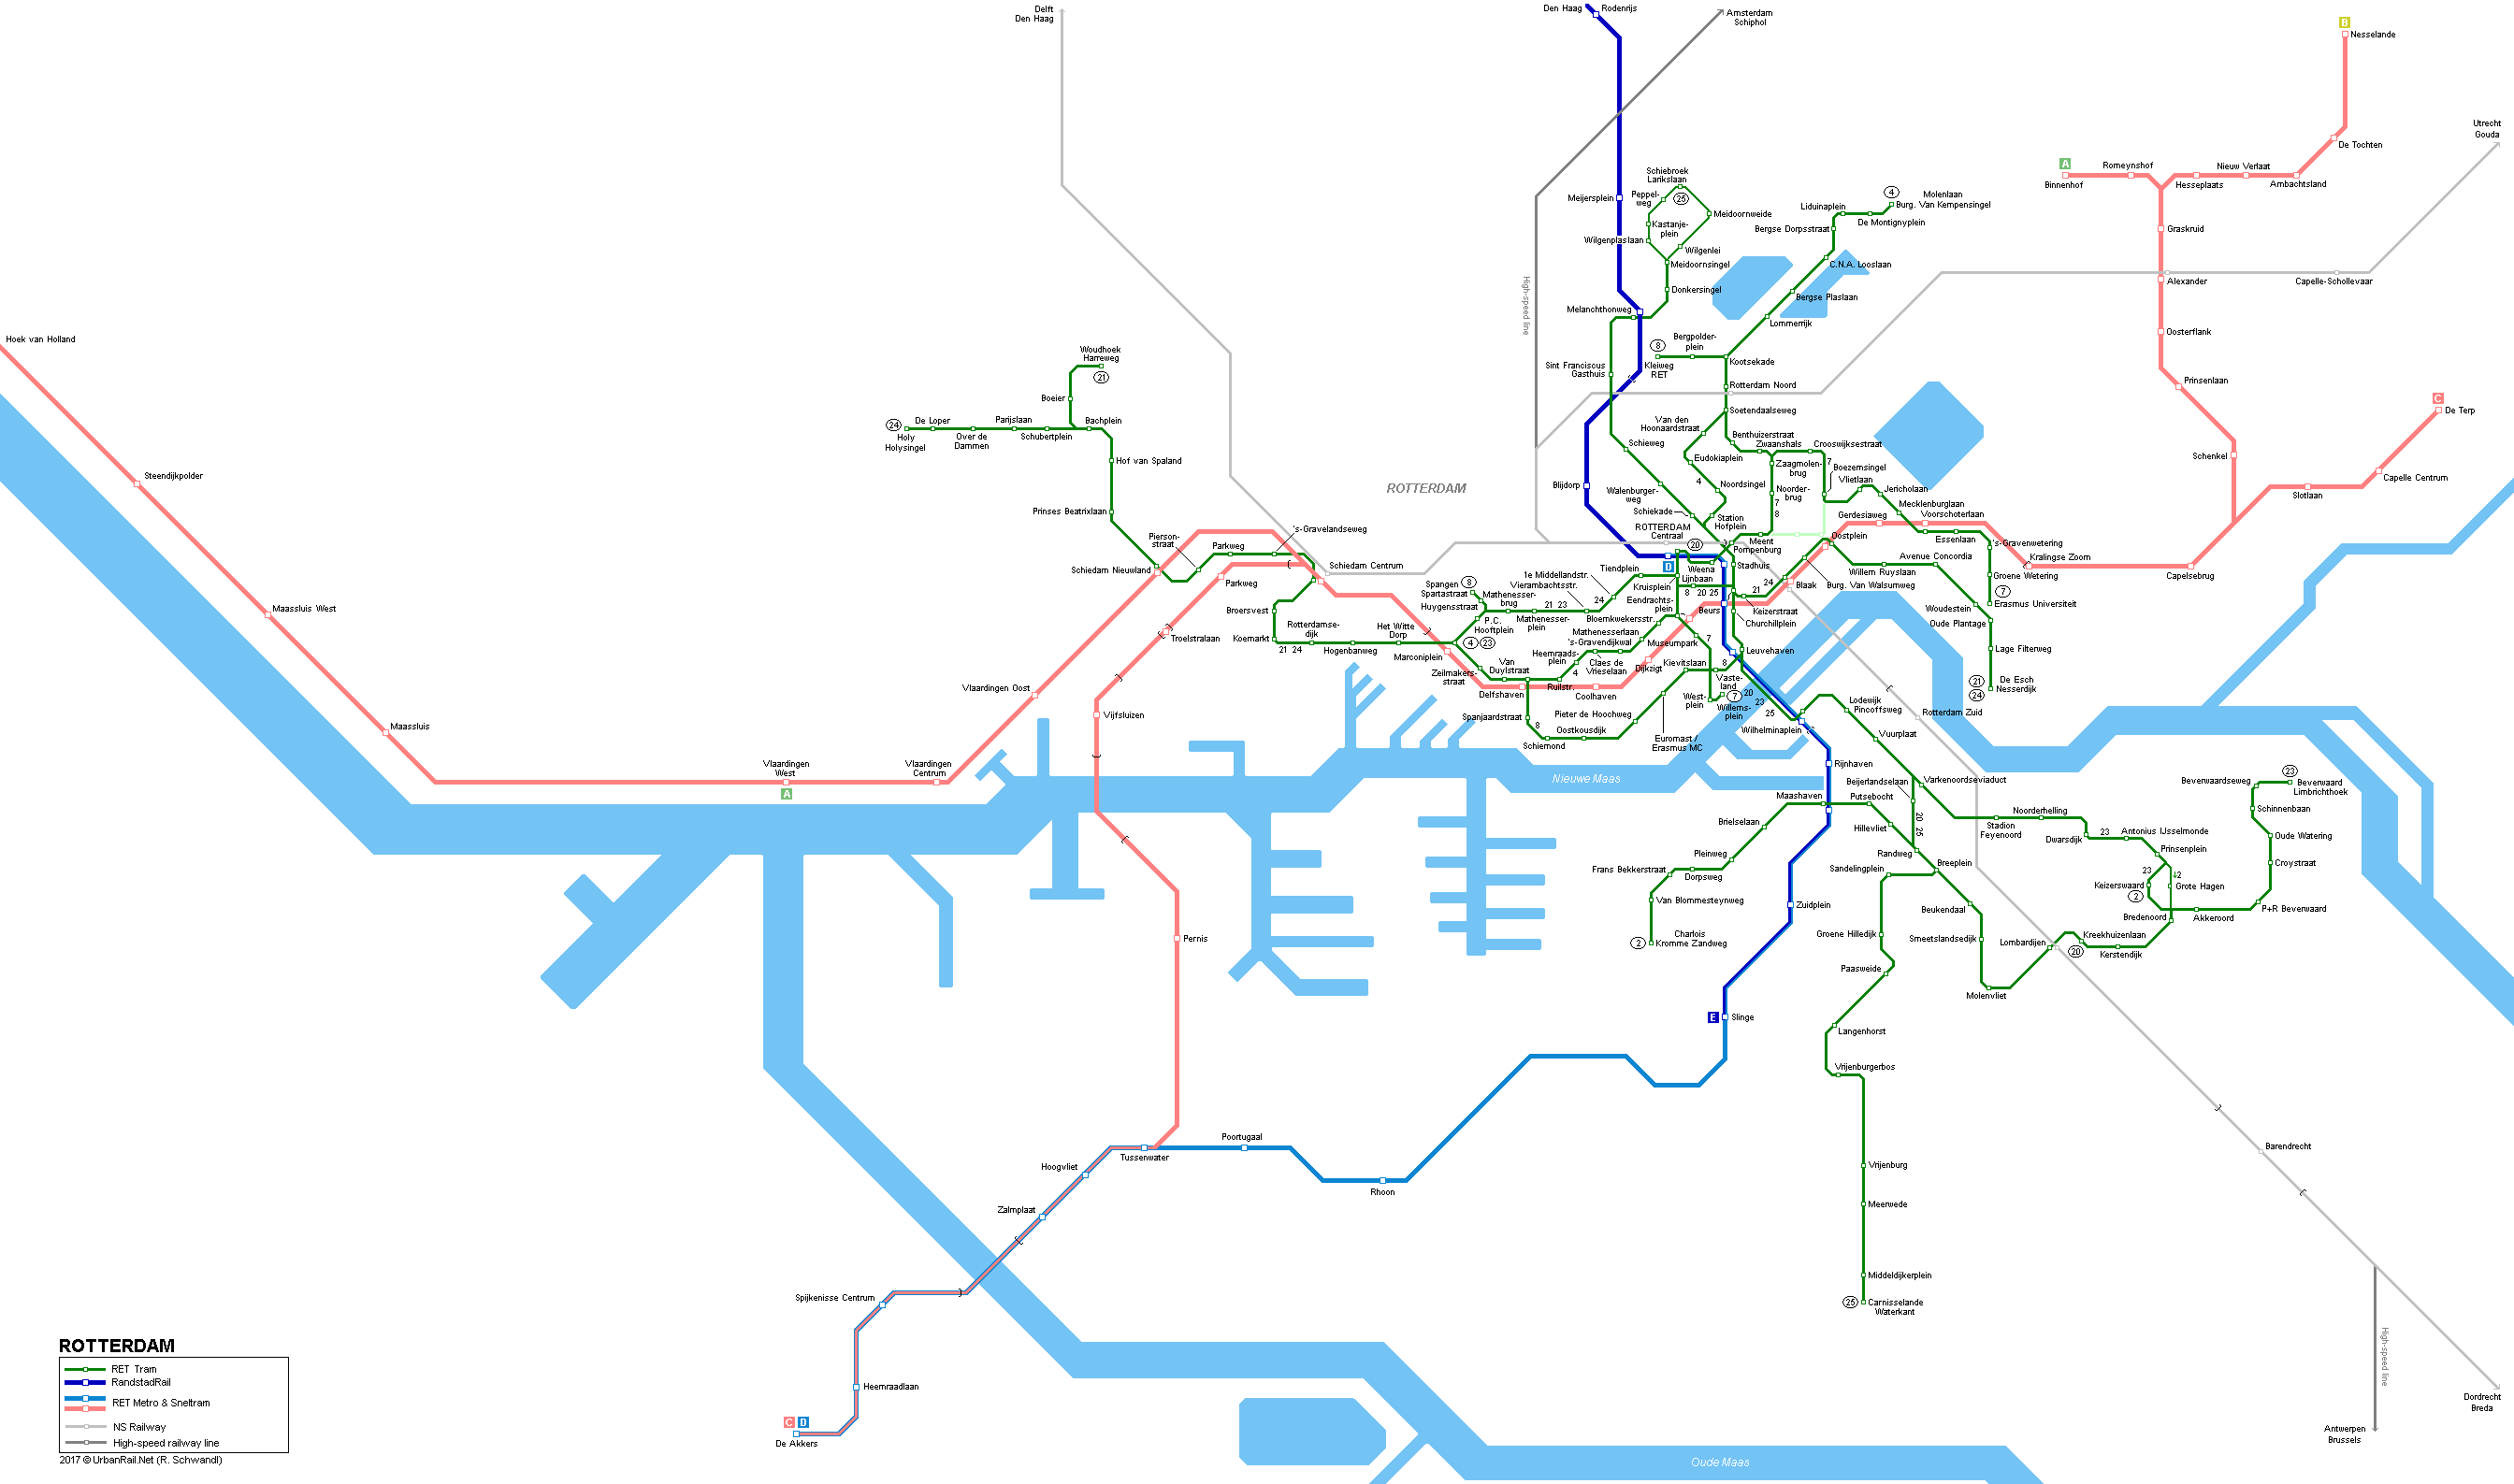 UrbanRail.Net > Rotterdam Tram & Metro Network Map